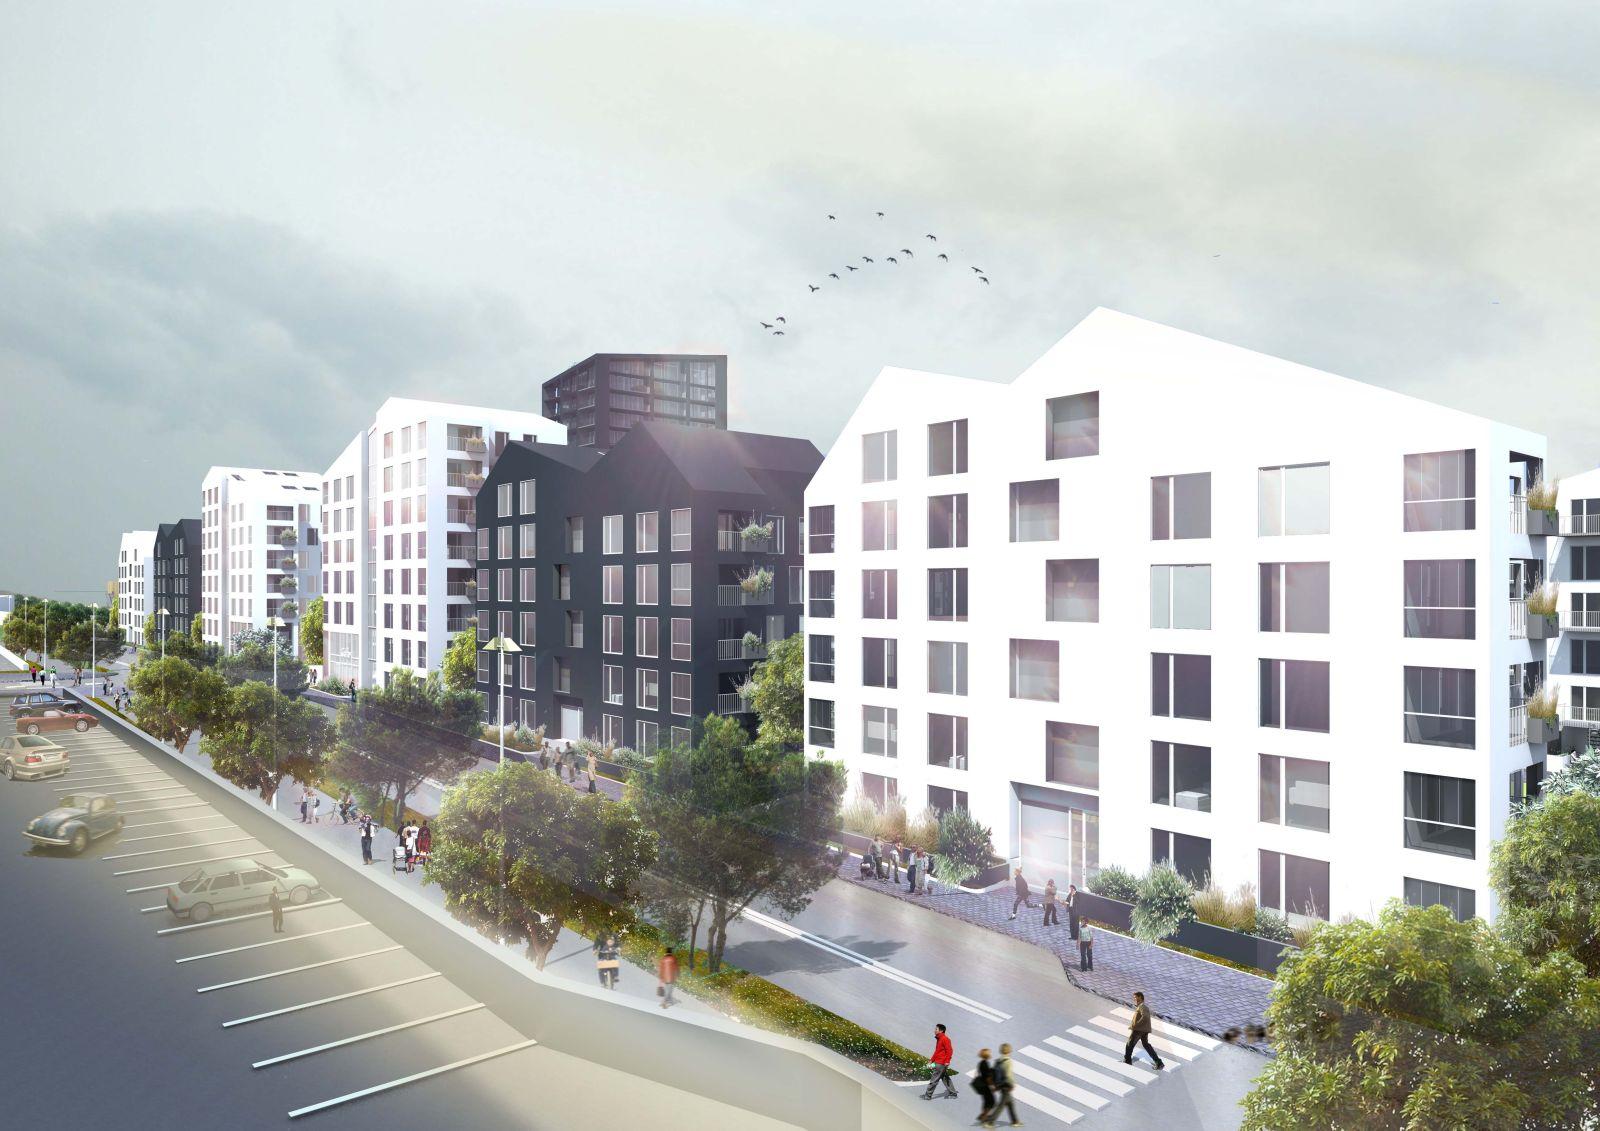 Housing in Stockholm